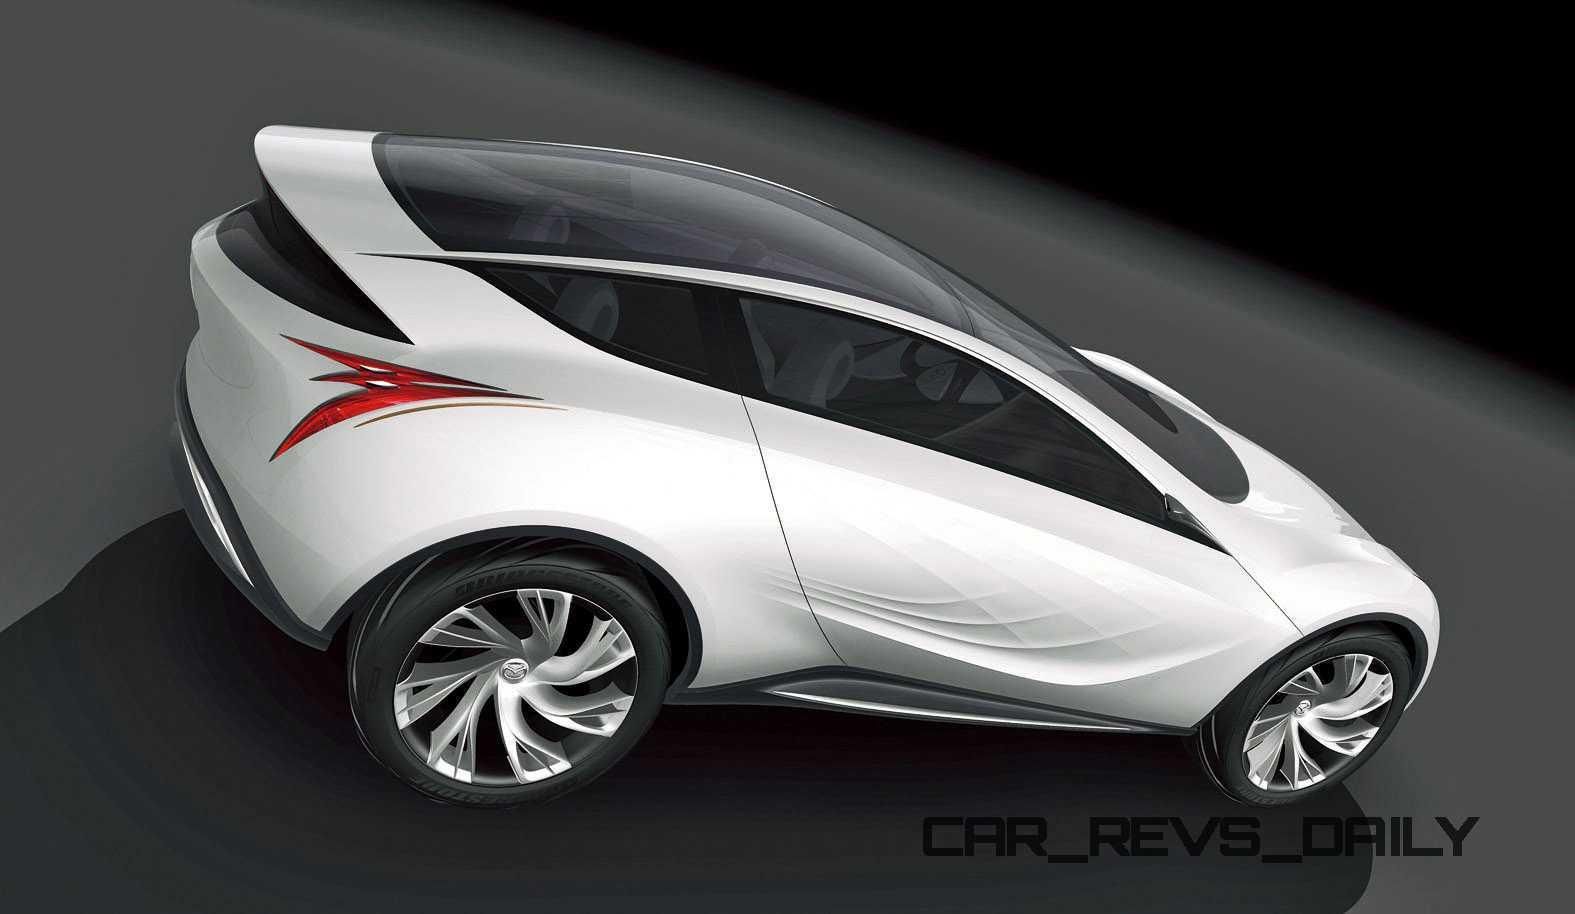 http://www.car-revs-daily.com/wp-content/uploads/2015/03/2008-Mazda-Kazamai-3.jpg